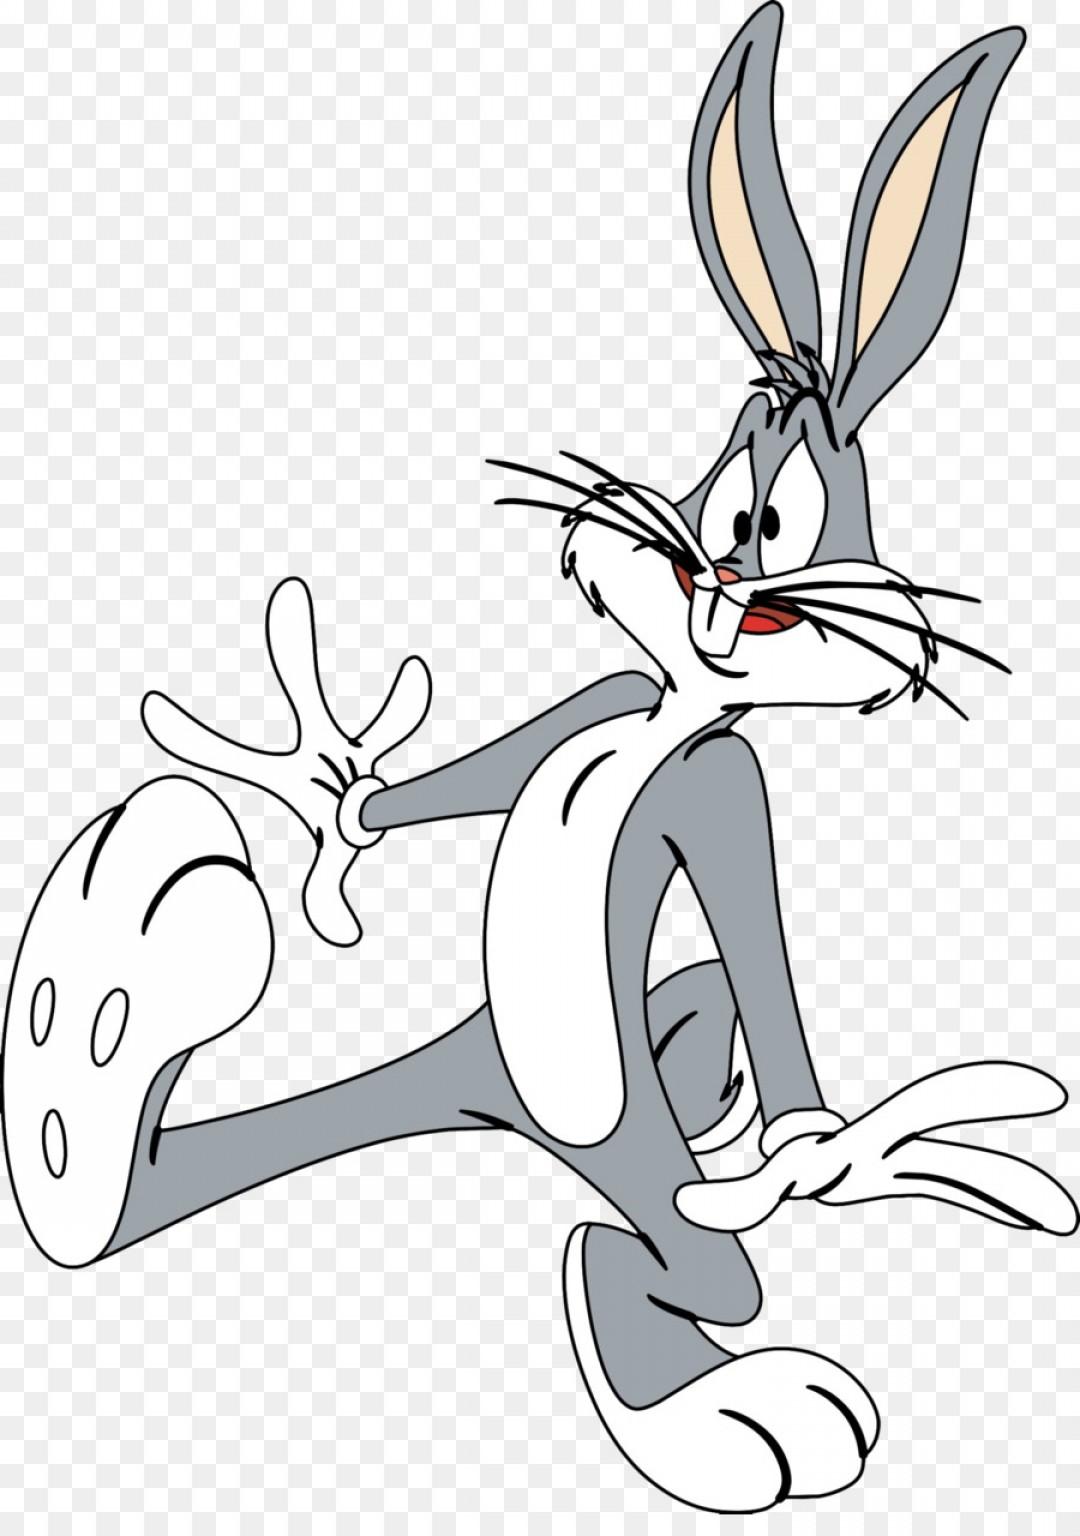 1080x1536 Png Bugs Bunny Easter Bunny Tasmanian Devil Clip Art B Lazttweet